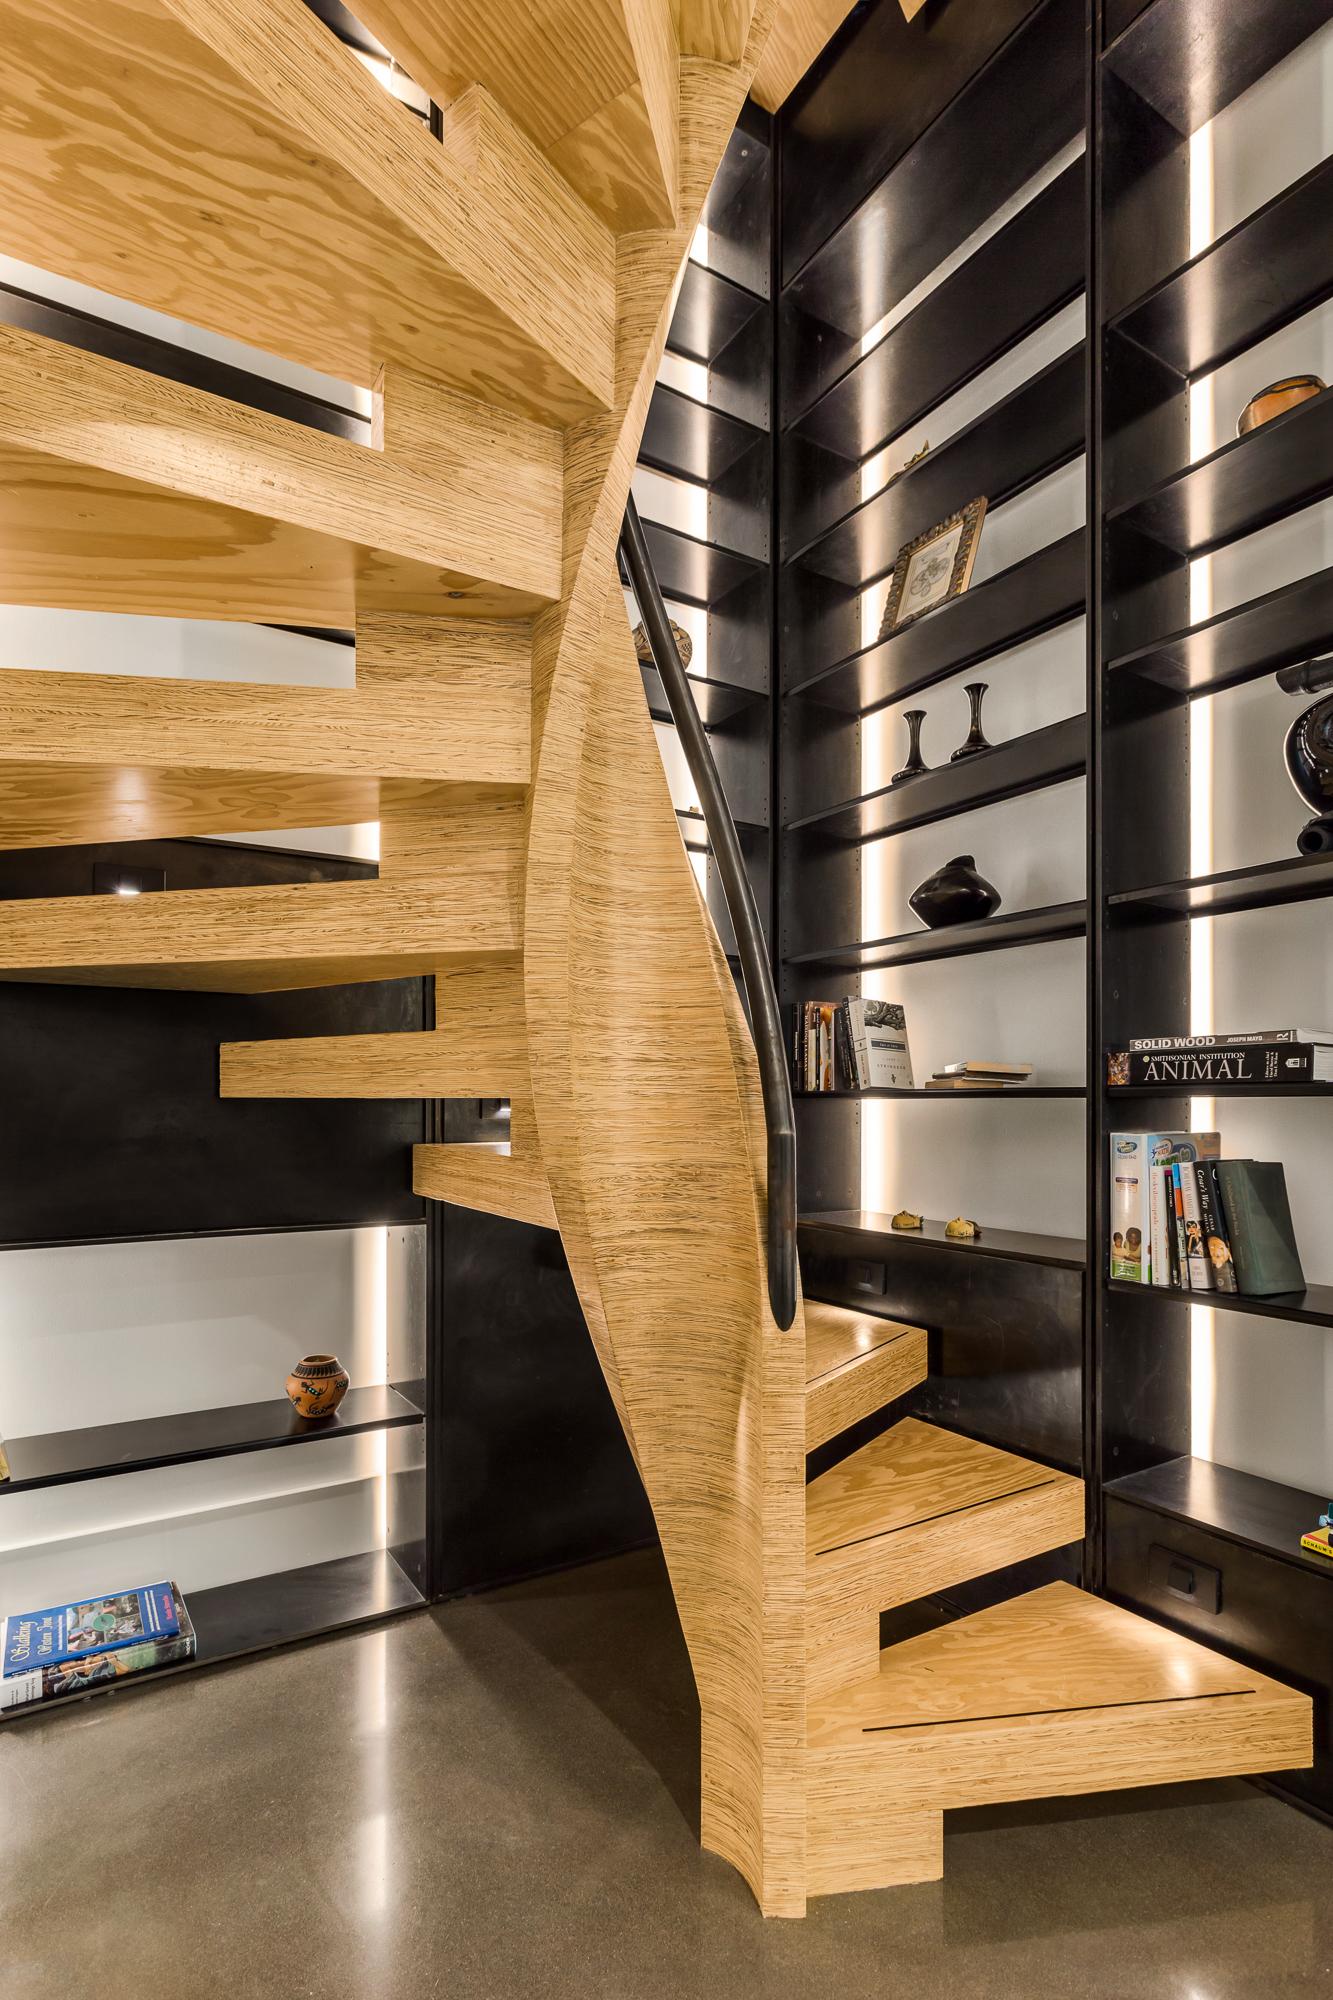 mw design workshop spiral staircase MPP plywood CNC